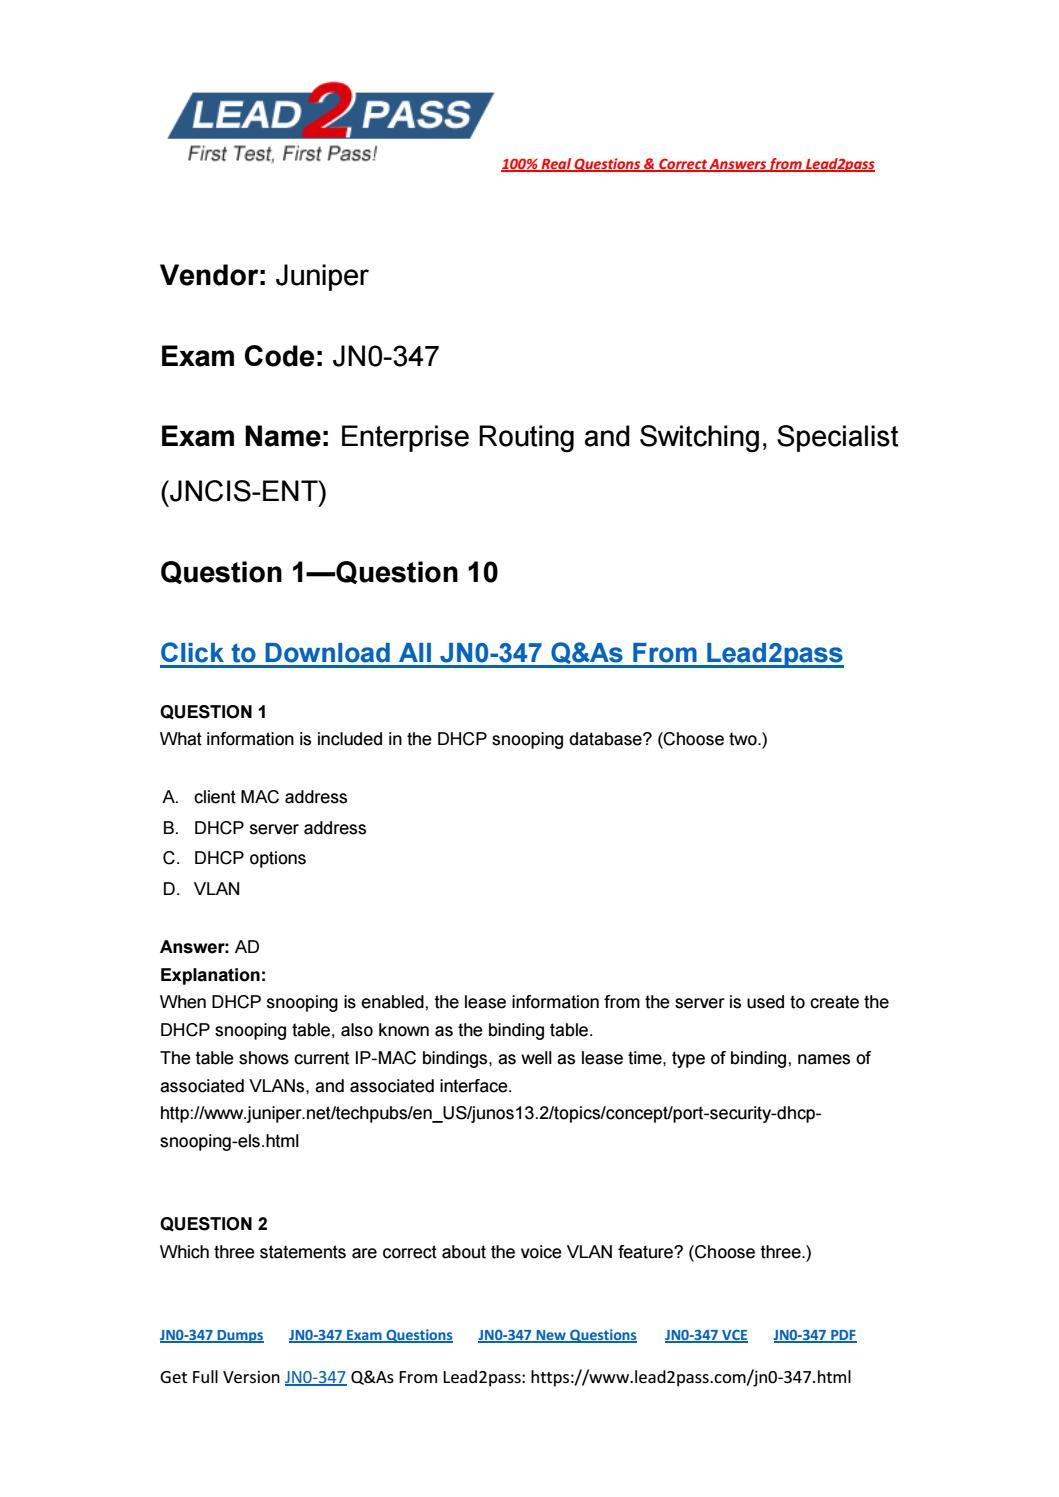 Lead2pass Free JN0-347 Exam Questions Download 100% Pass JN0